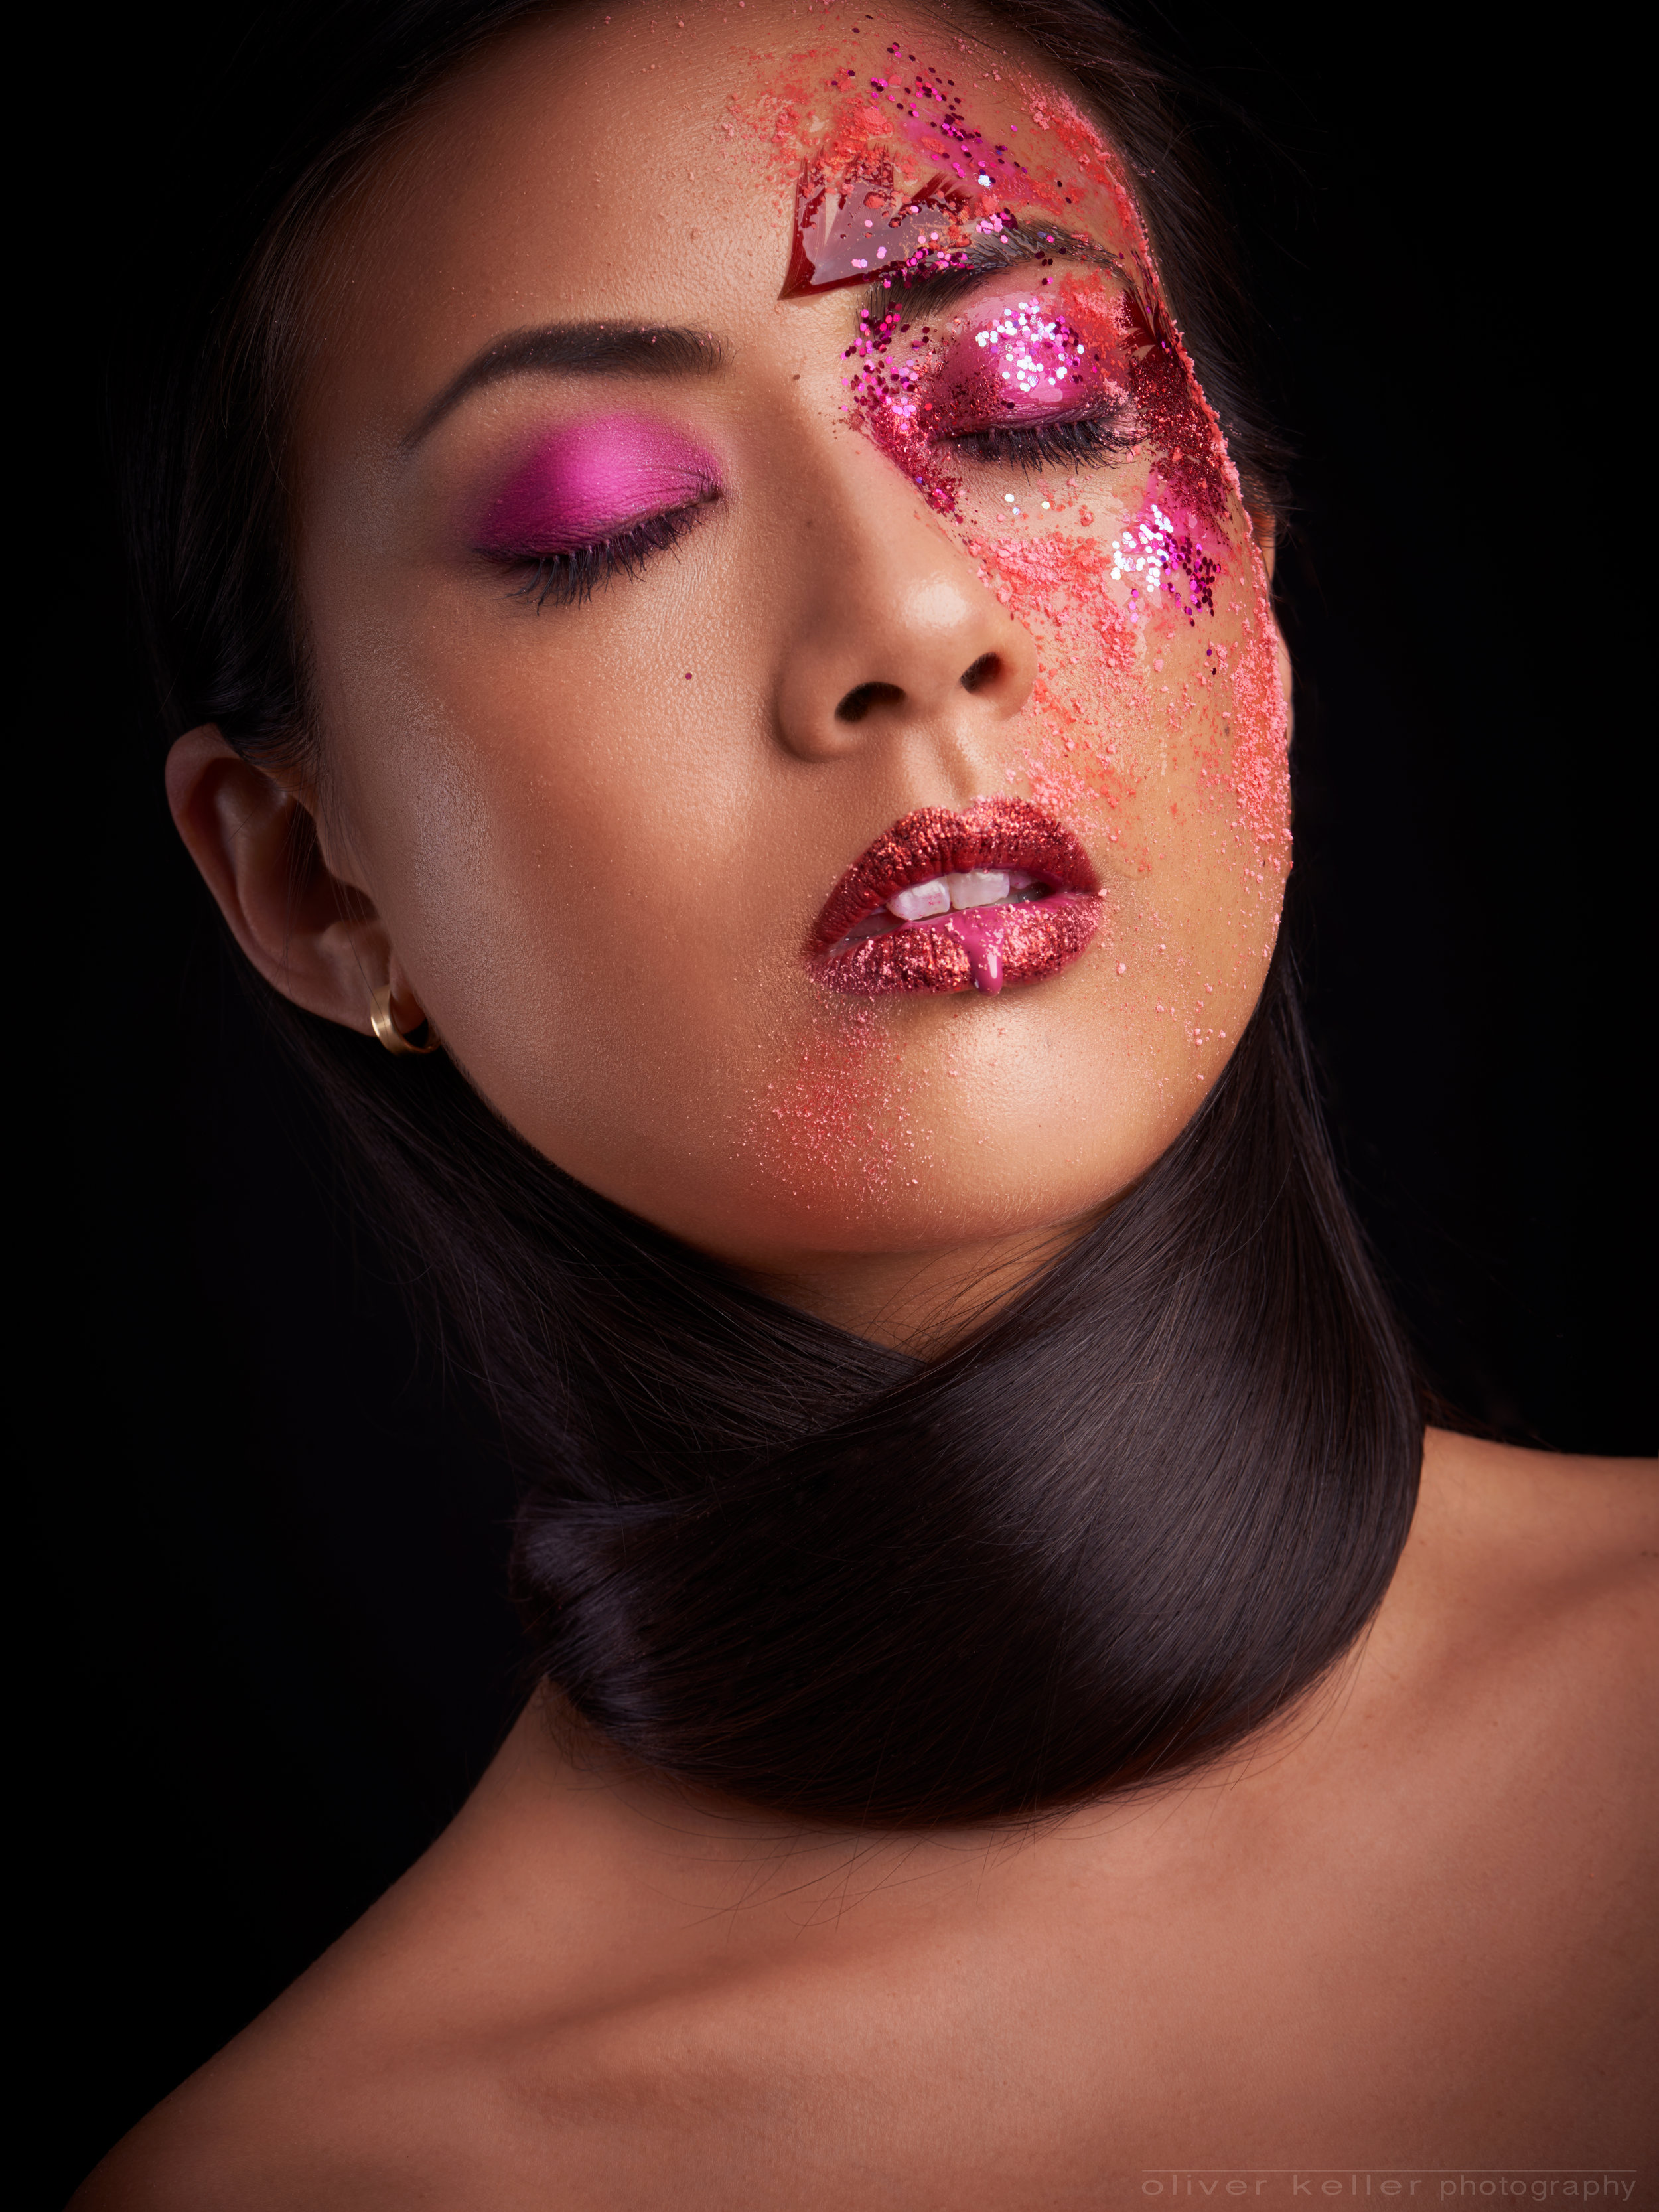 2018-04-30-beauty-Minh15695.jpg